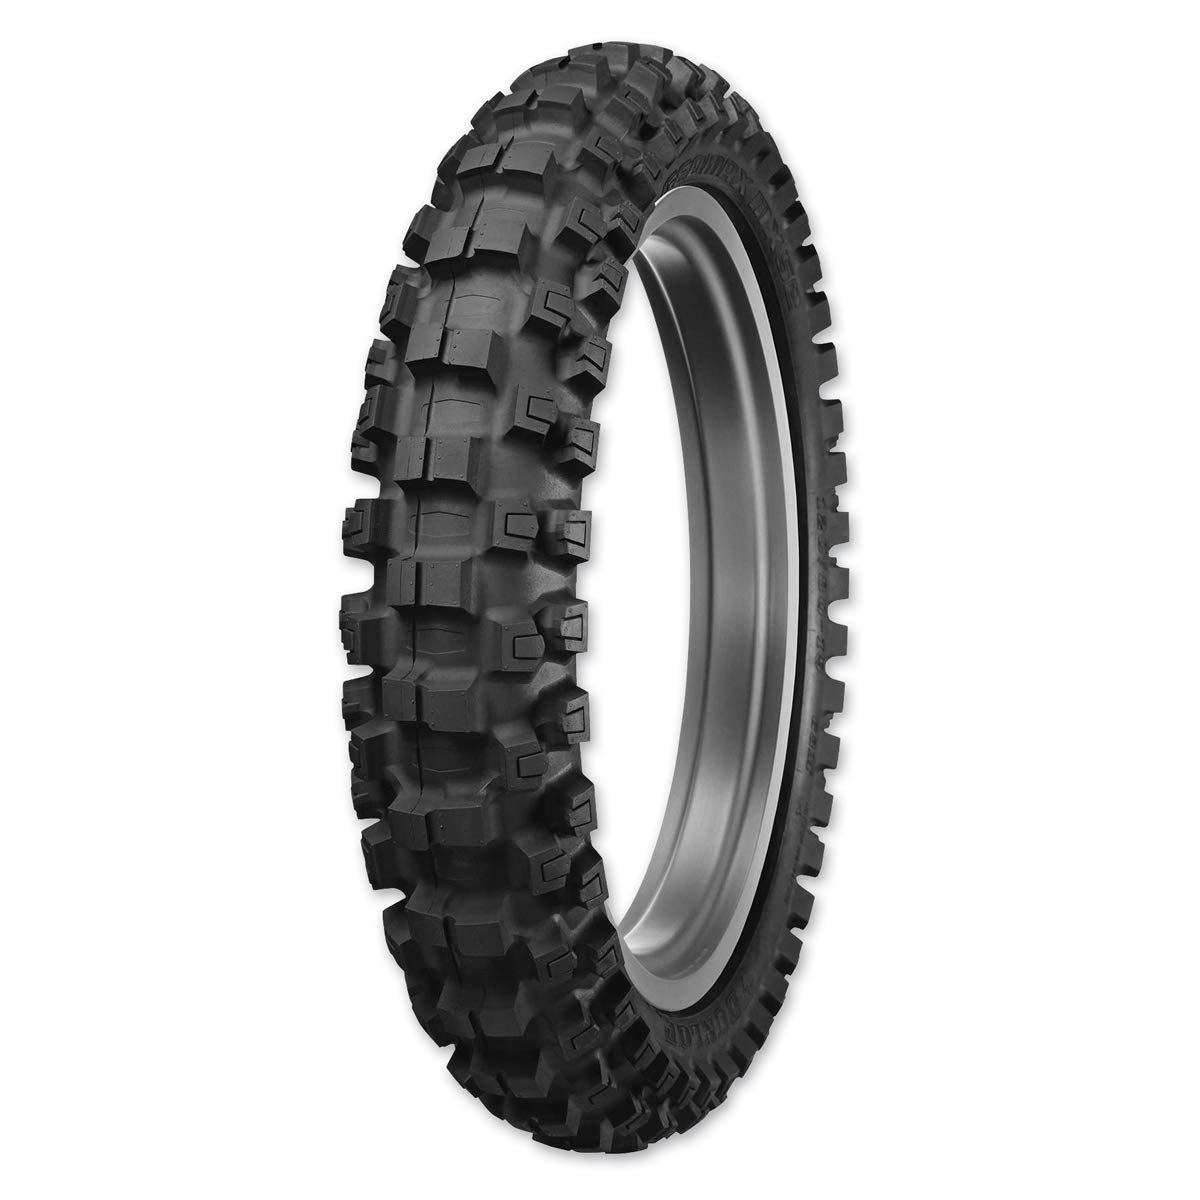 Dunlop MX52 90/100-16 I/T-H/T Rear Tire 52MX14